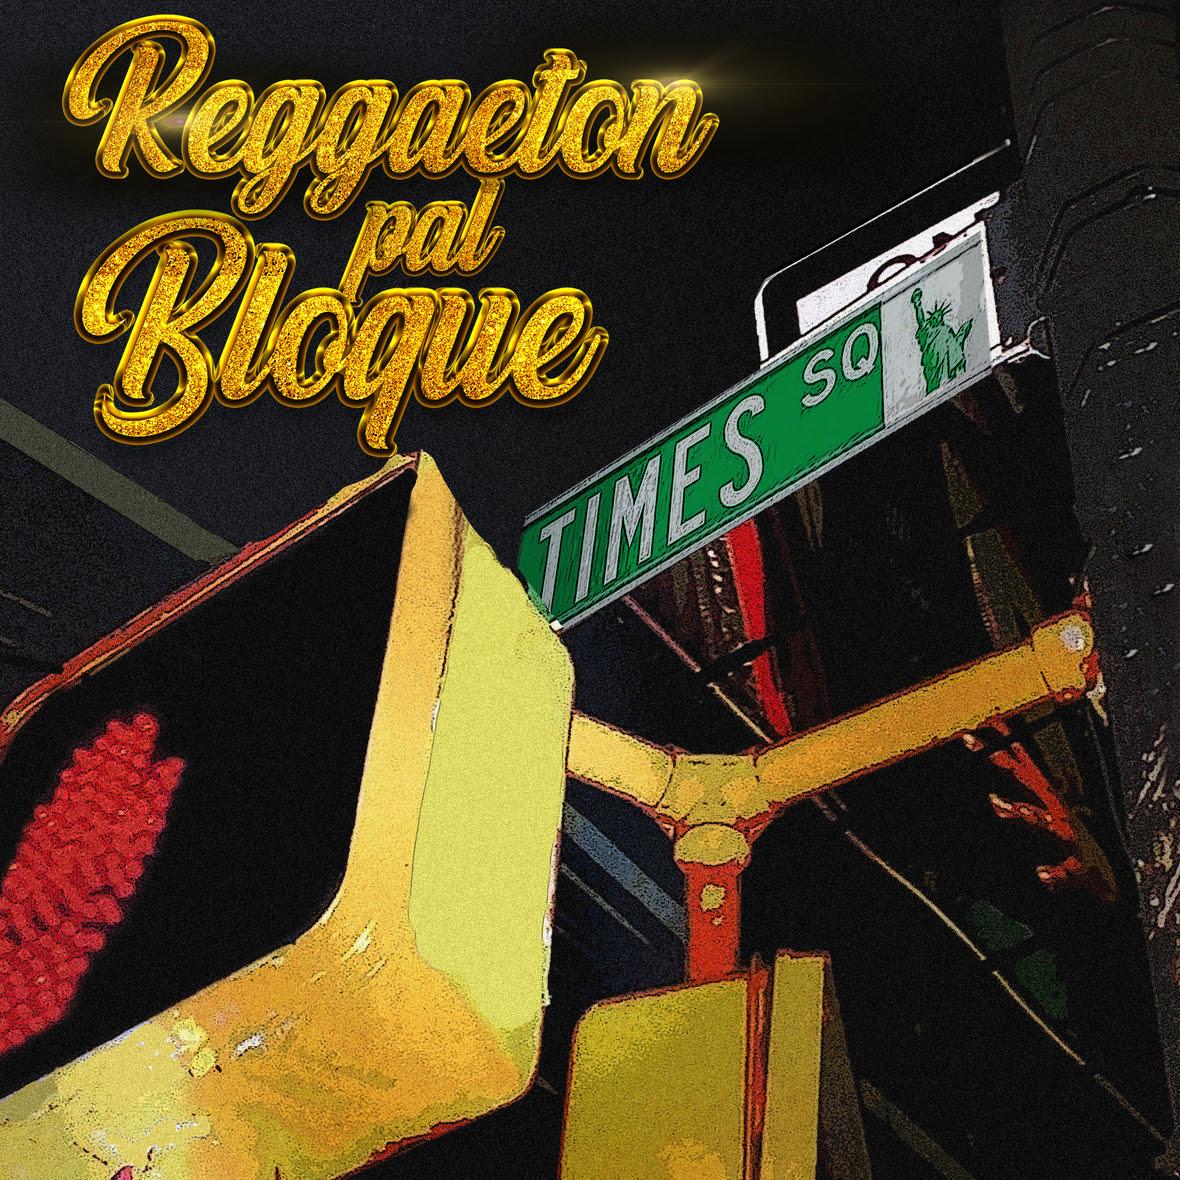 Caratula-DJ-Eric-Presenta-Reggaeton-Pal-Bloque